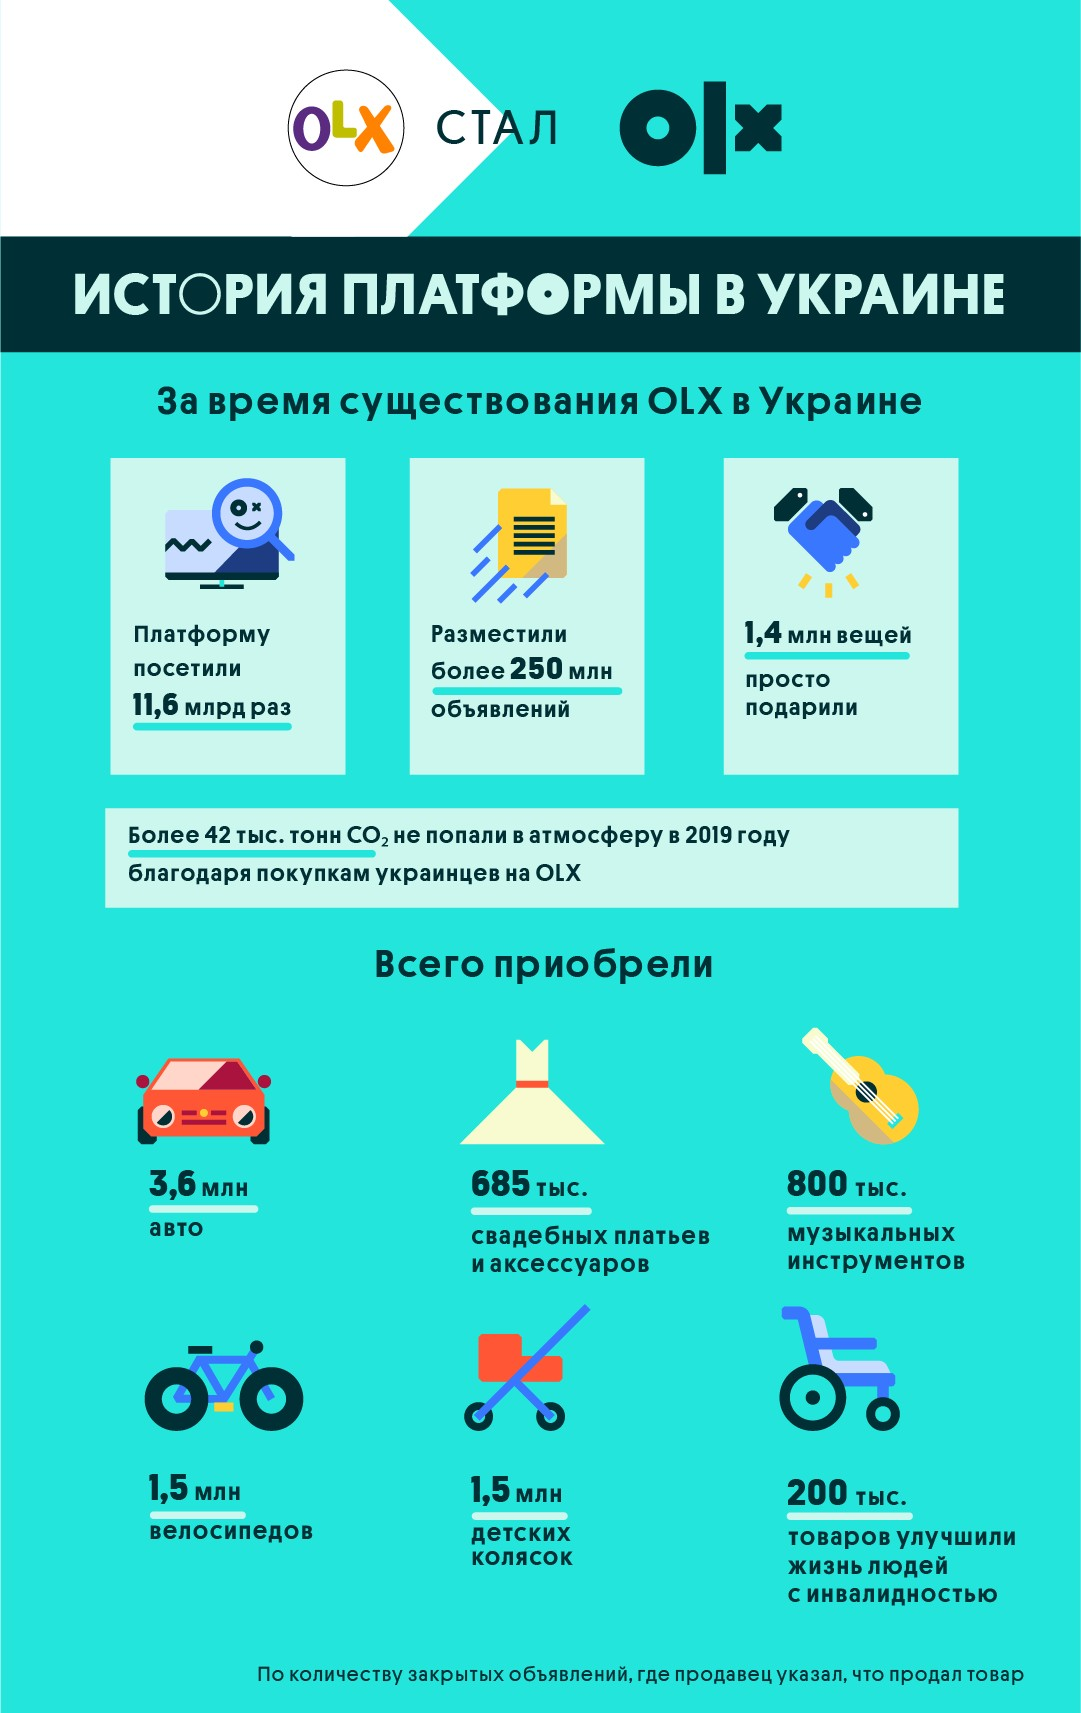 Инфографика_Ребрендинг OLX_Как изменилась платформа и айдентика